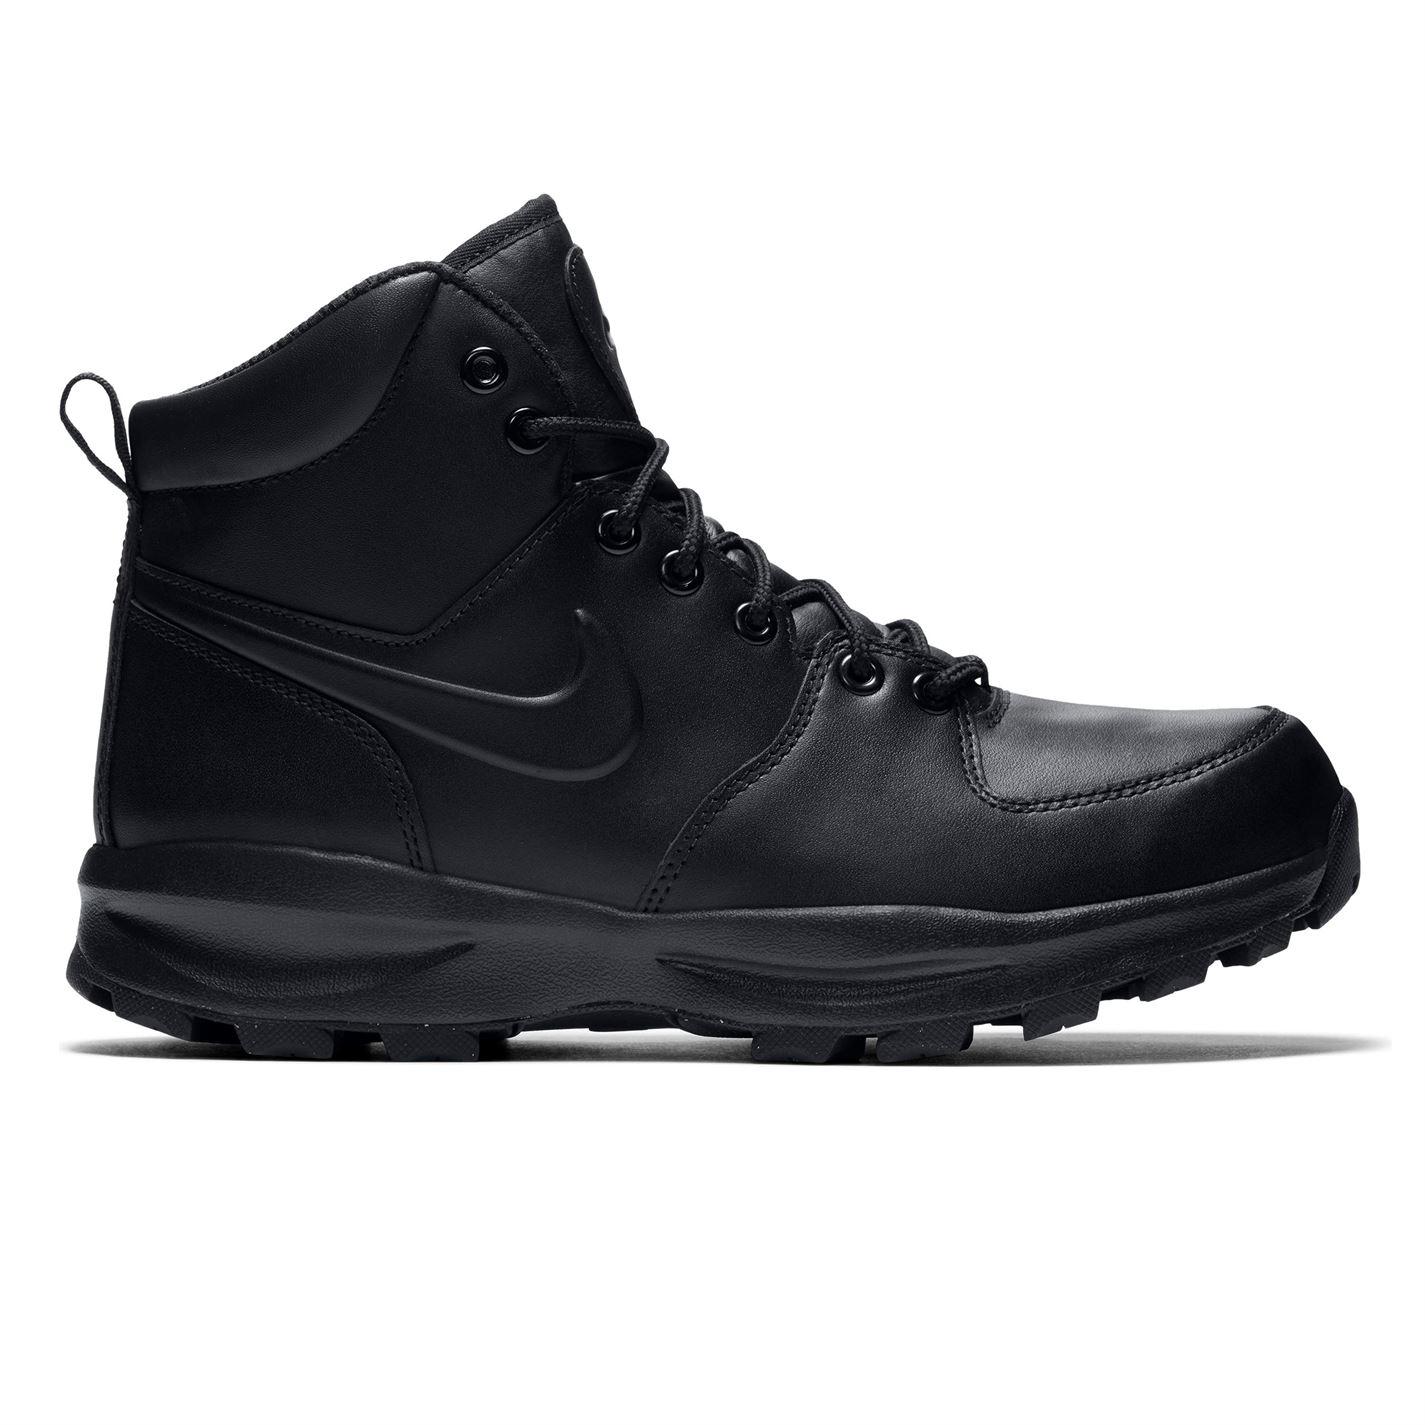 Nike Manoa Leather pánske topánky